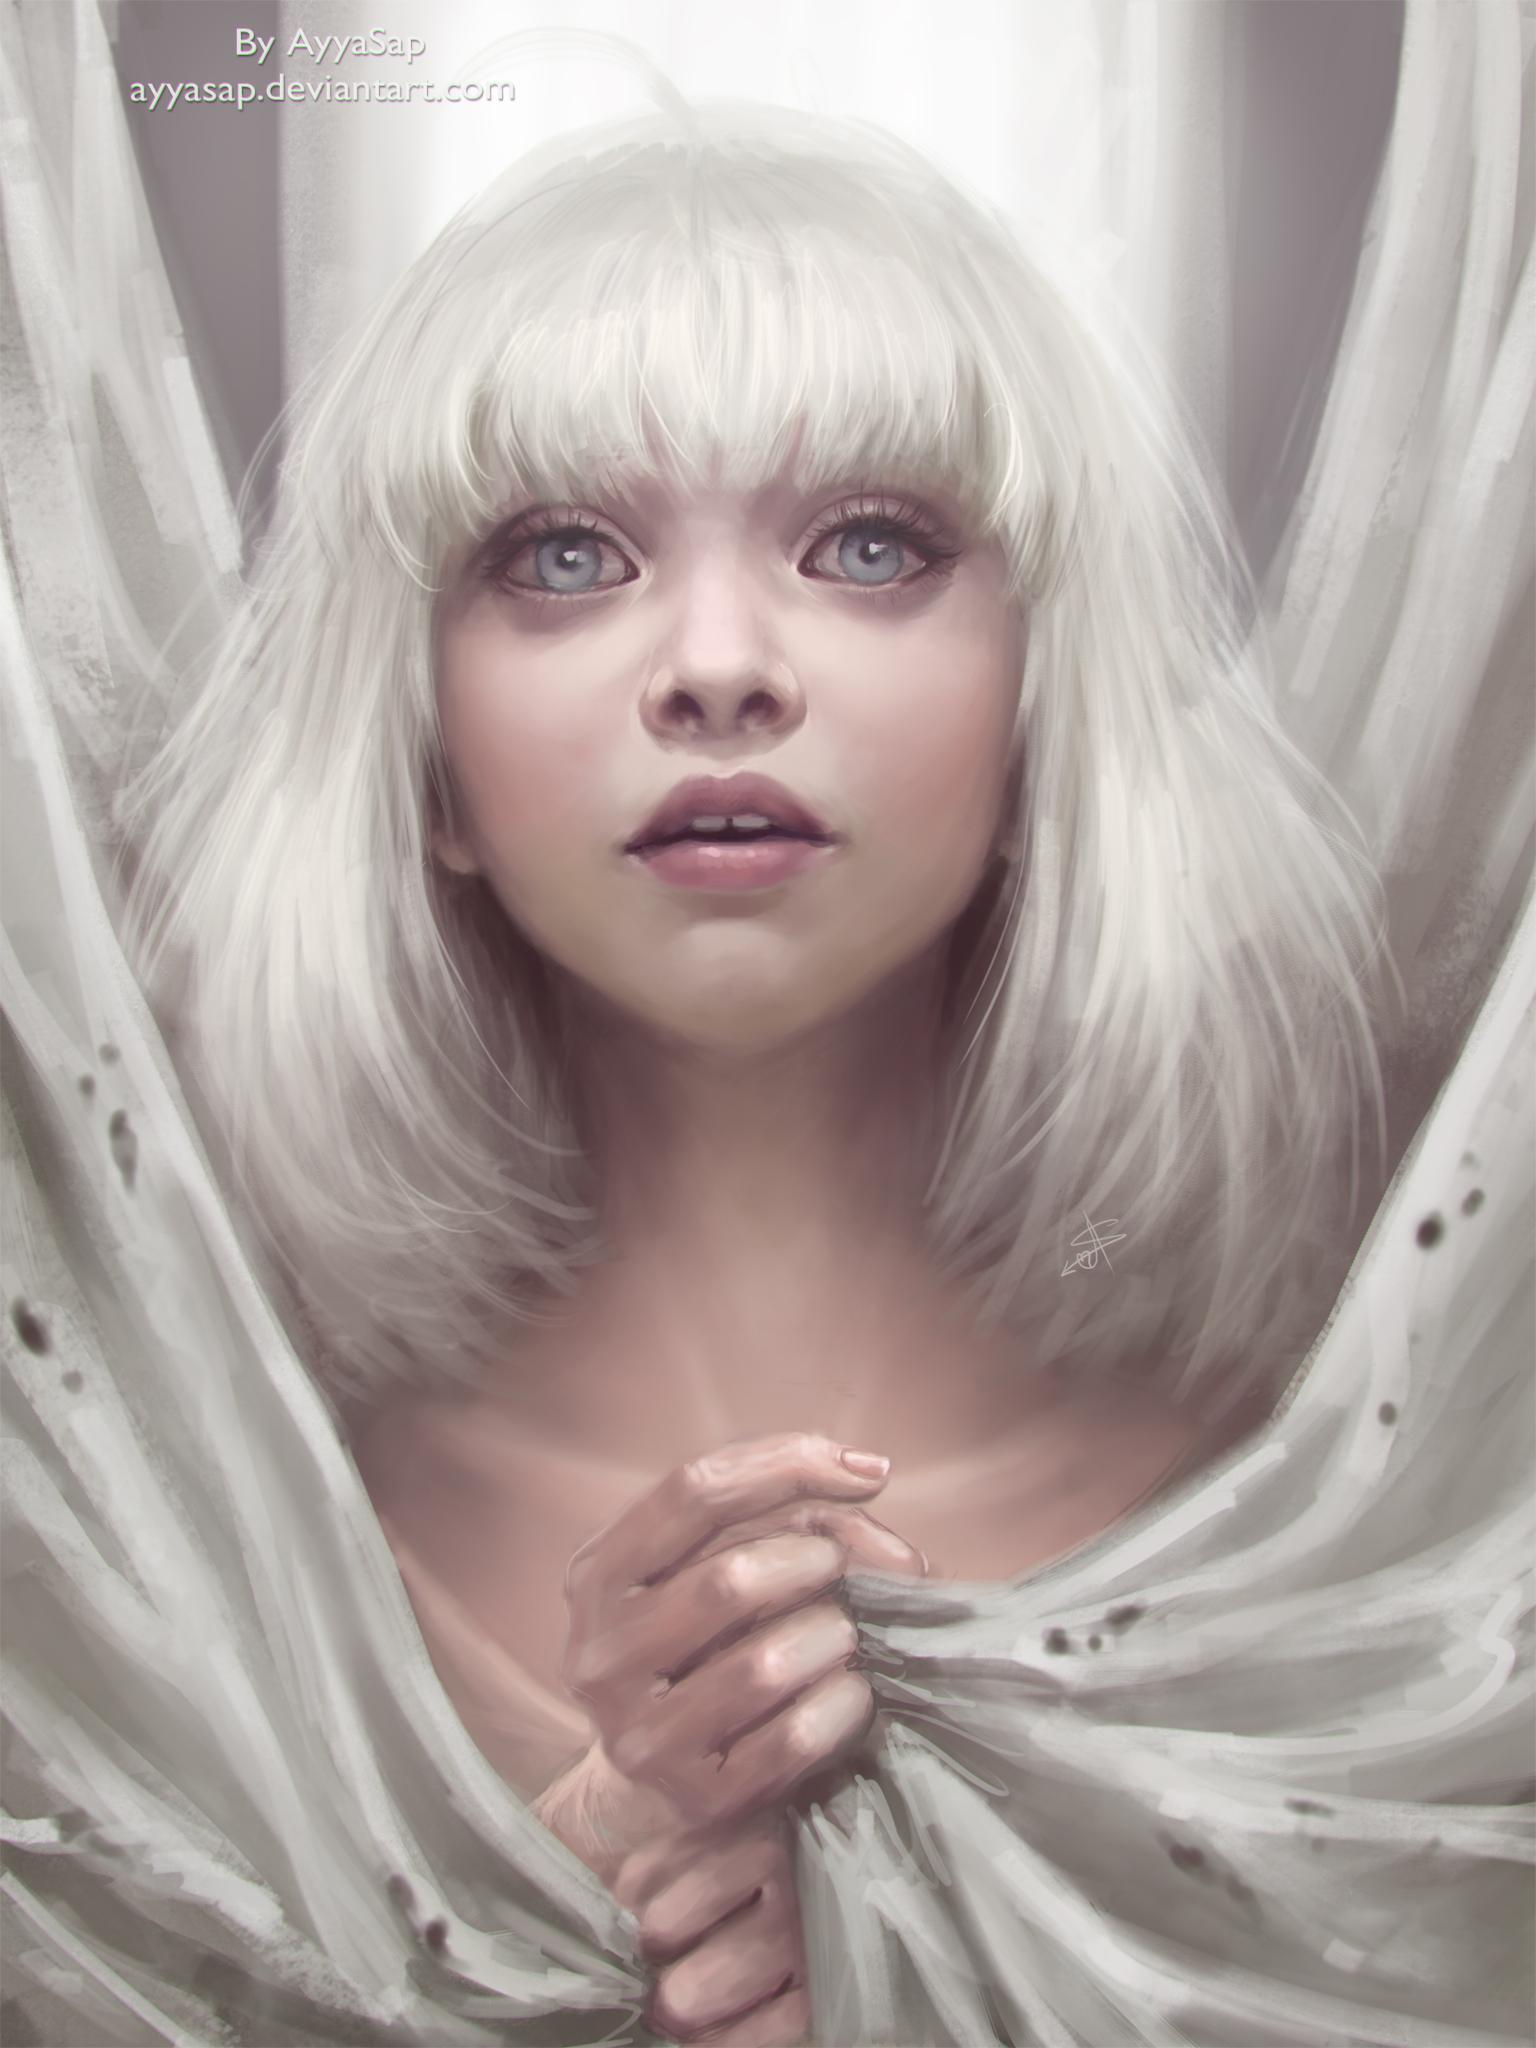 Maddie Ziegler (Sia - Chandelier) by AyyaSap